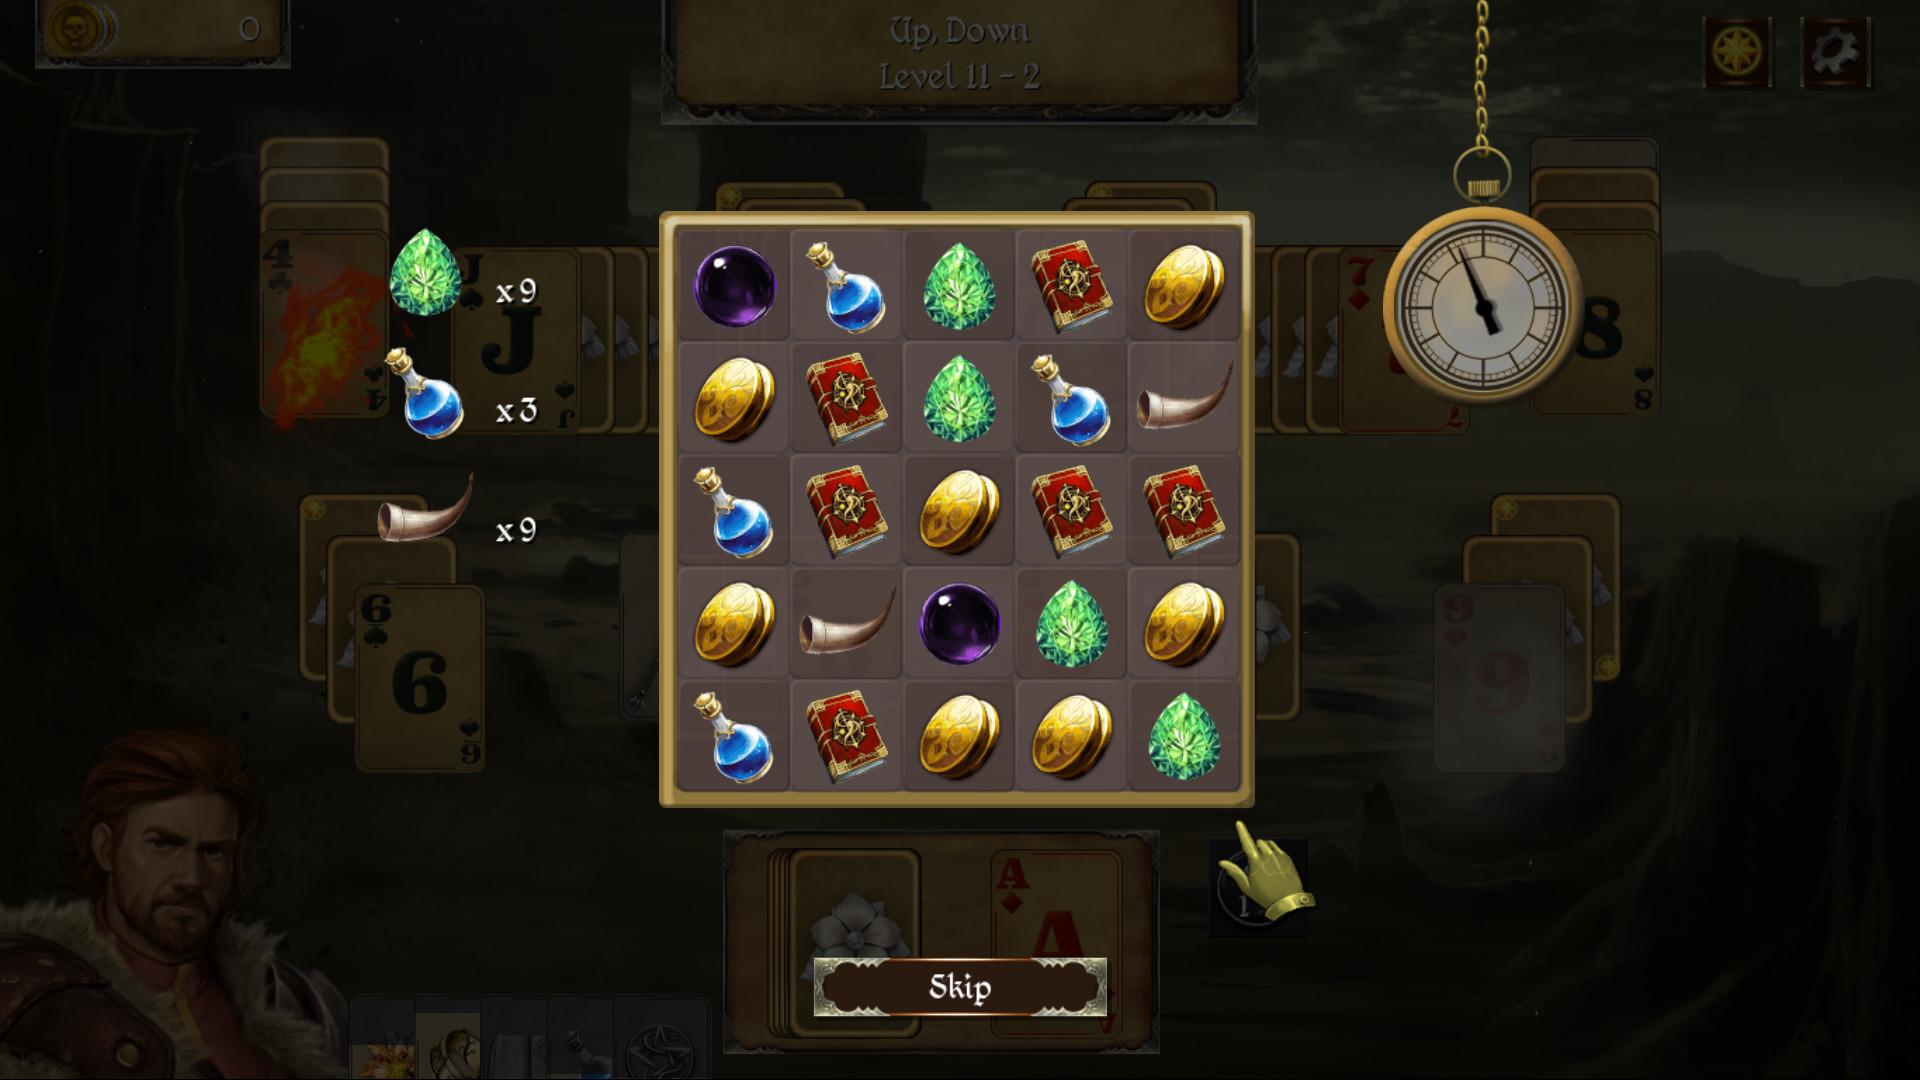 Legends of Solitaire: Diamond Relic screenshot